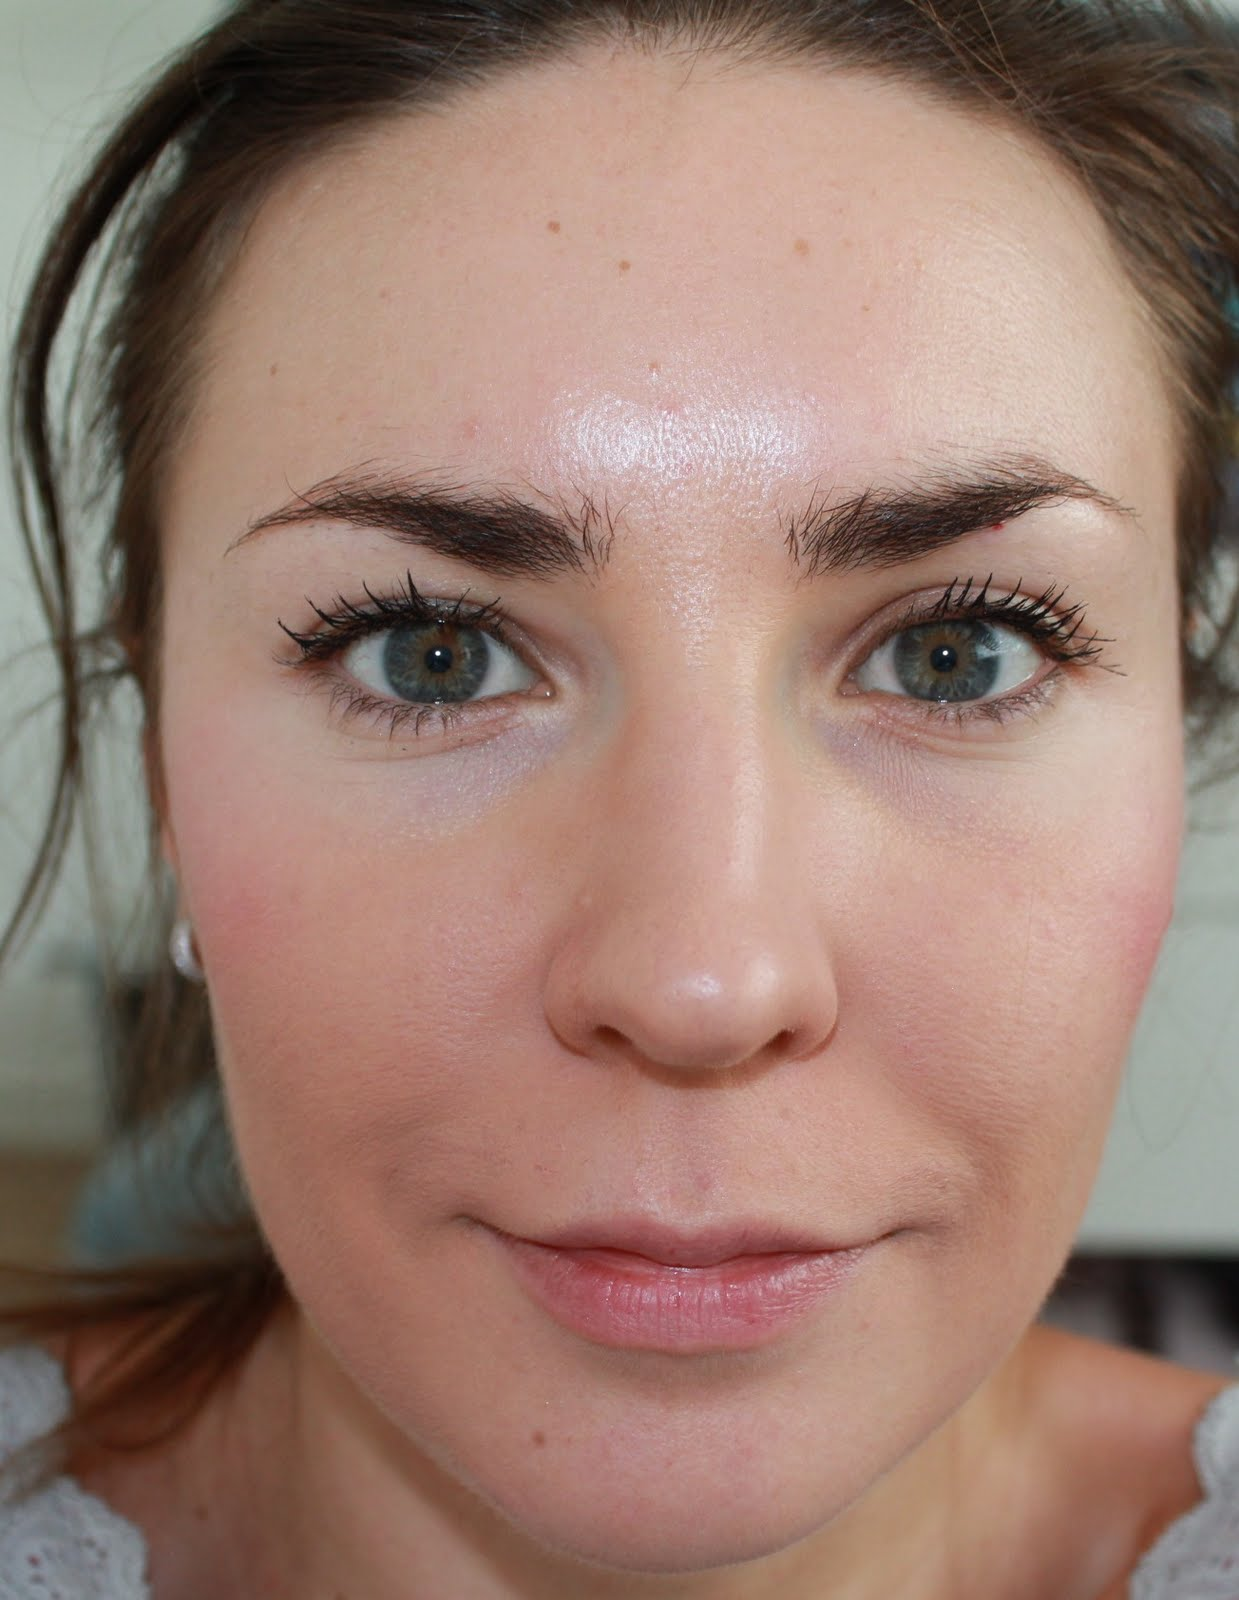 maquillage pour camoufler cicatrice